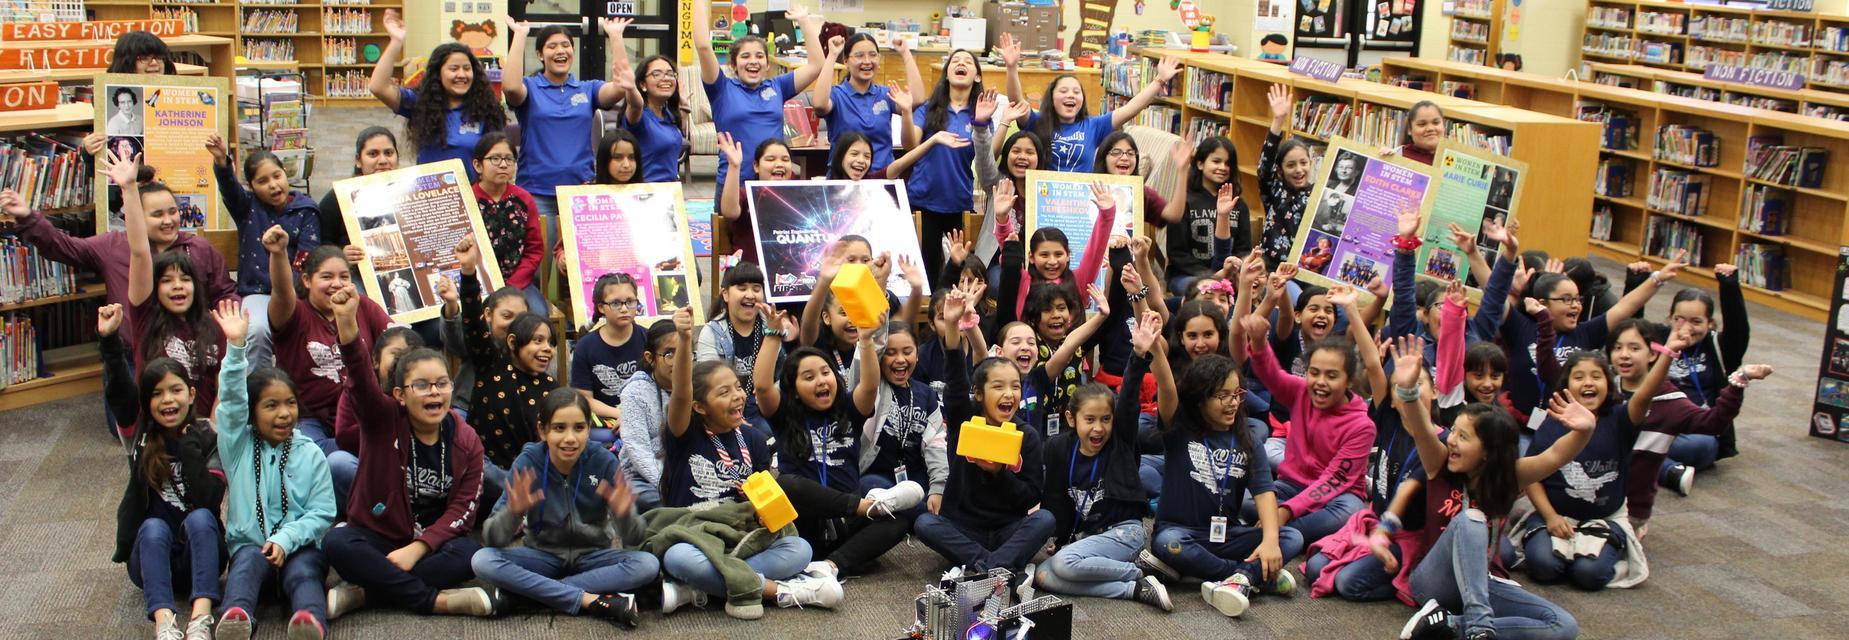 VMHS Girls Can presentation